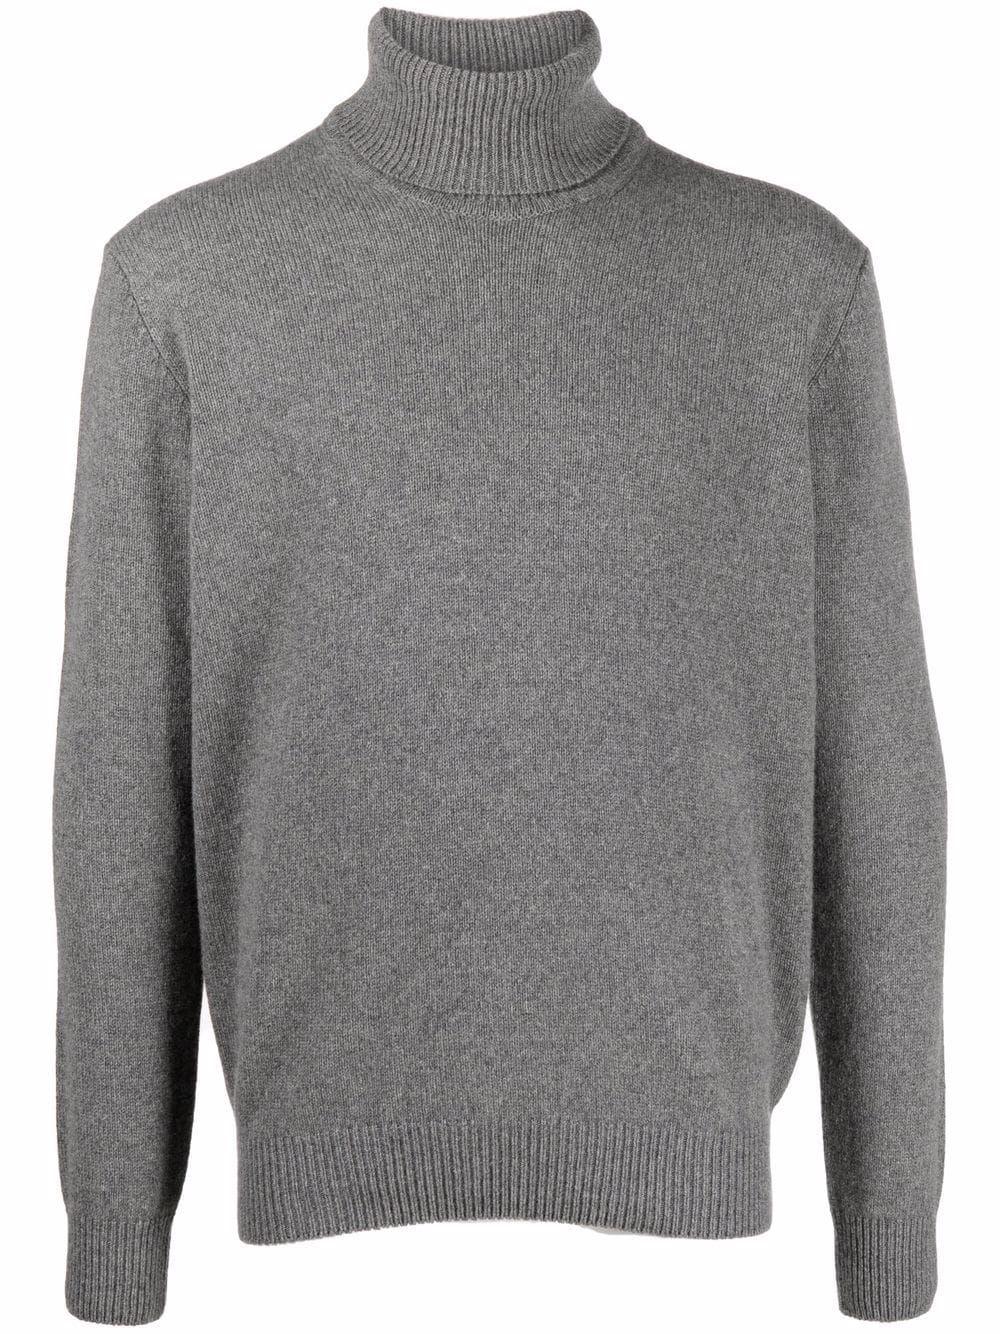 Lardini maglie grigio